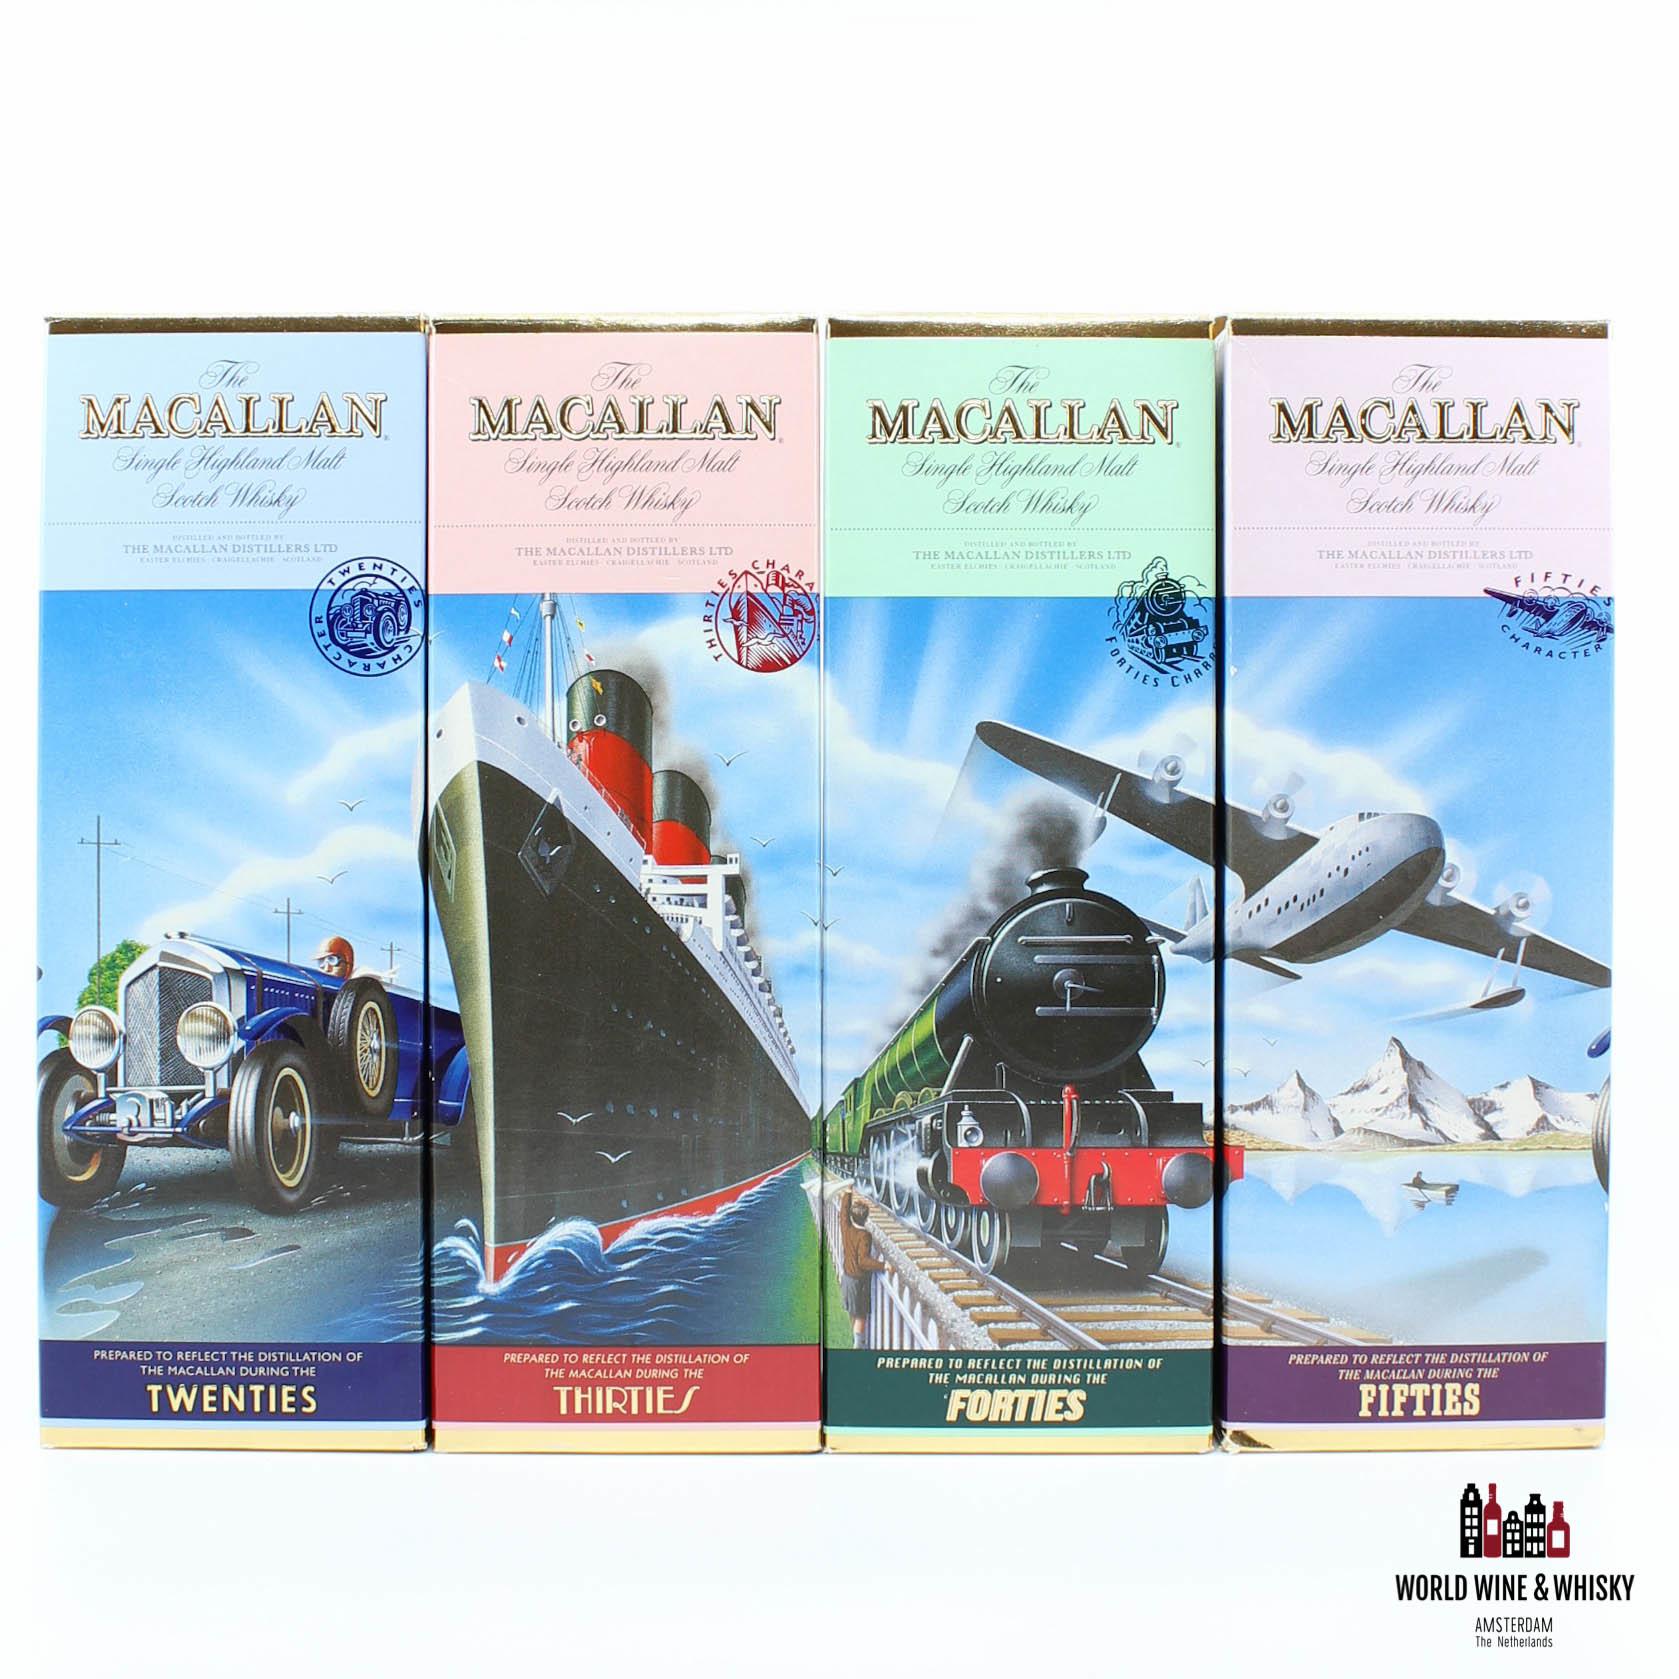 Macallan Macallan Travel Series 1920, 1930, 1940 & 1950 500ml 40% (full set)